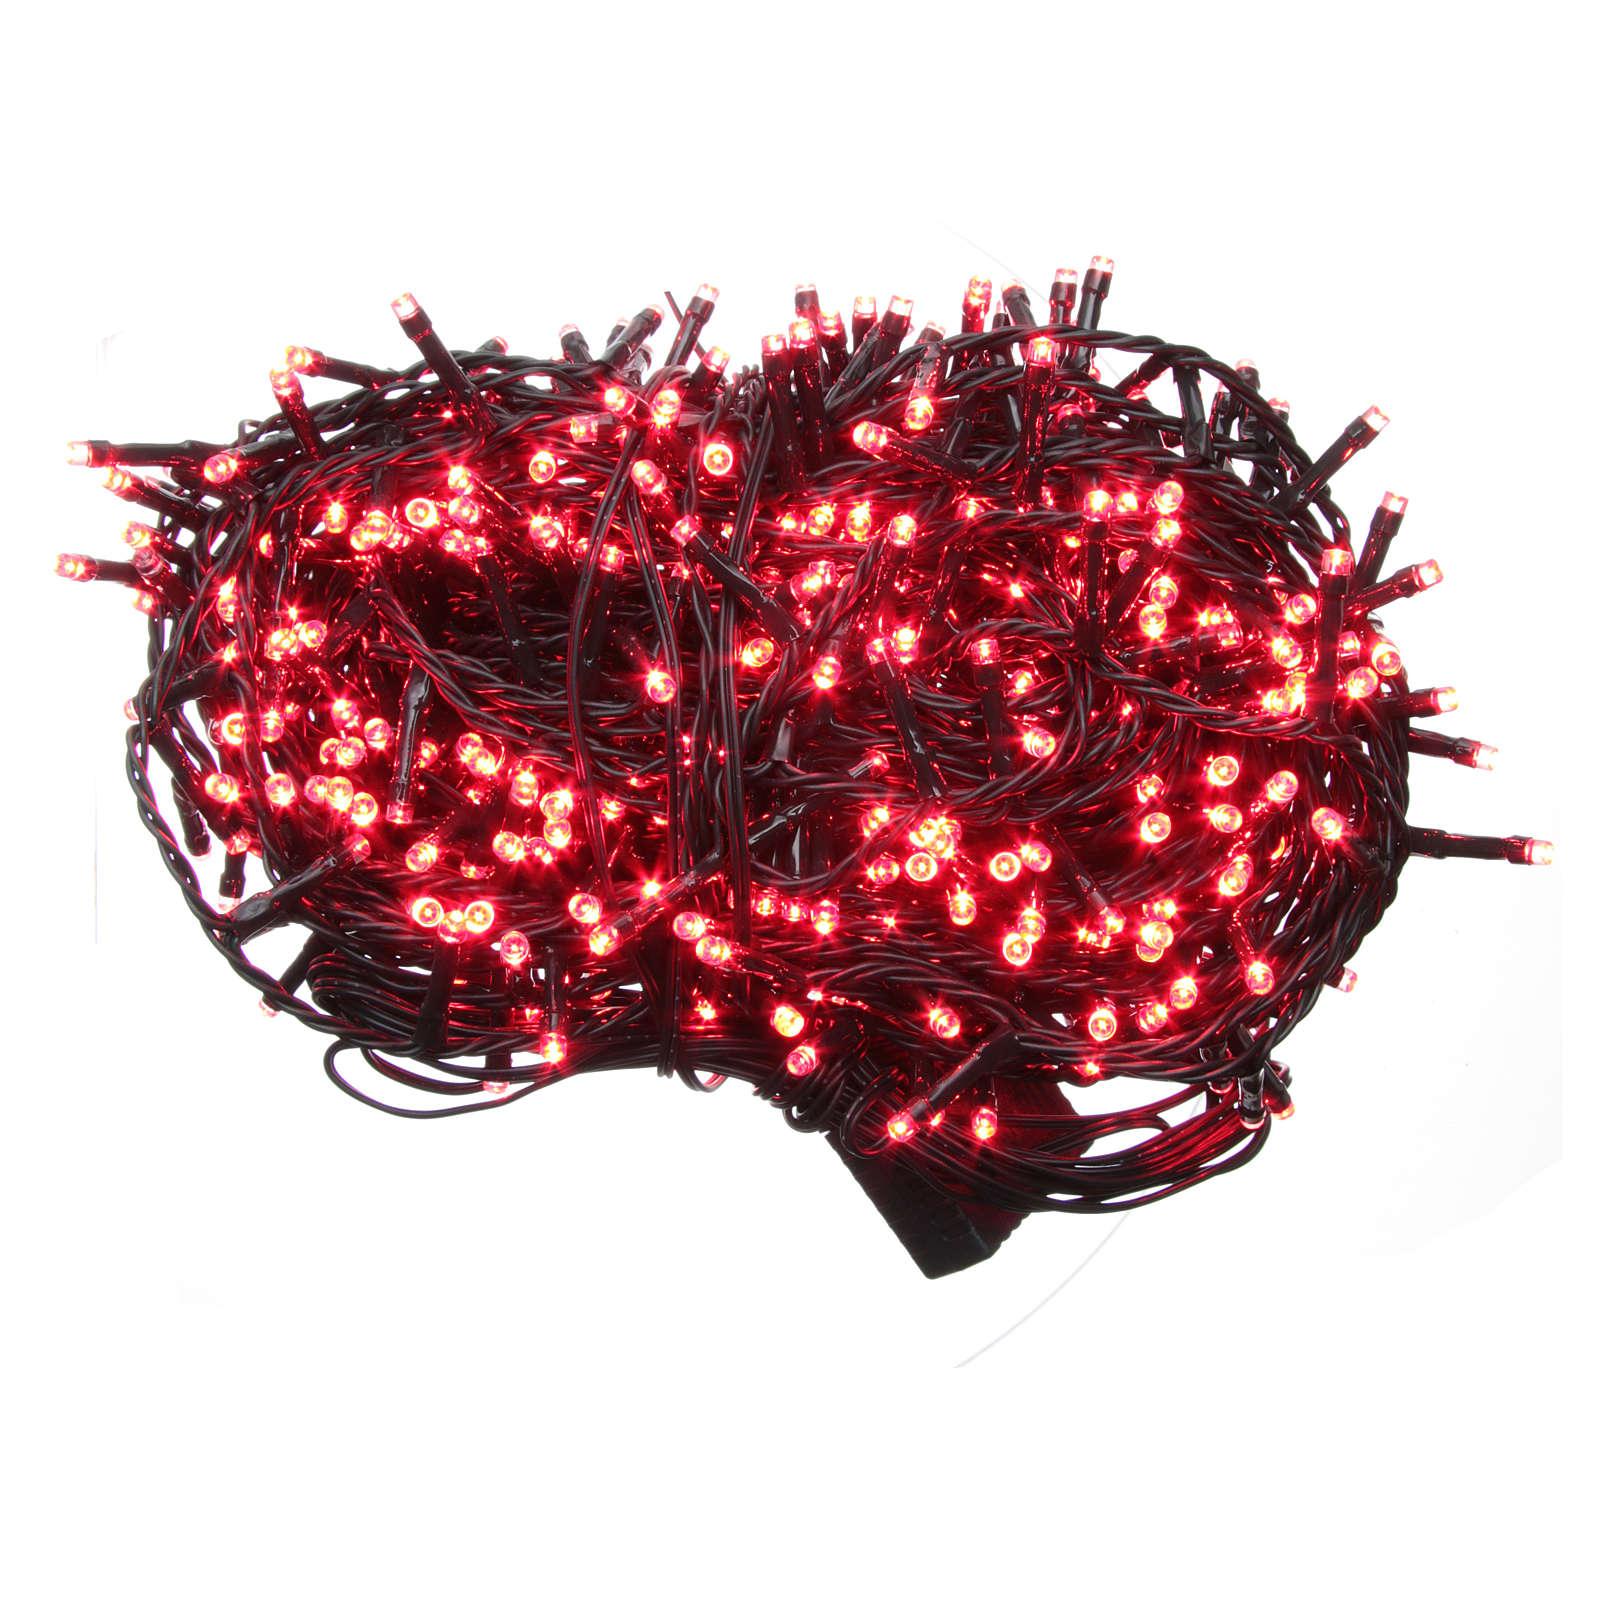 Luce Natale catena 600 LED rosse ESTERNO programmabili 3